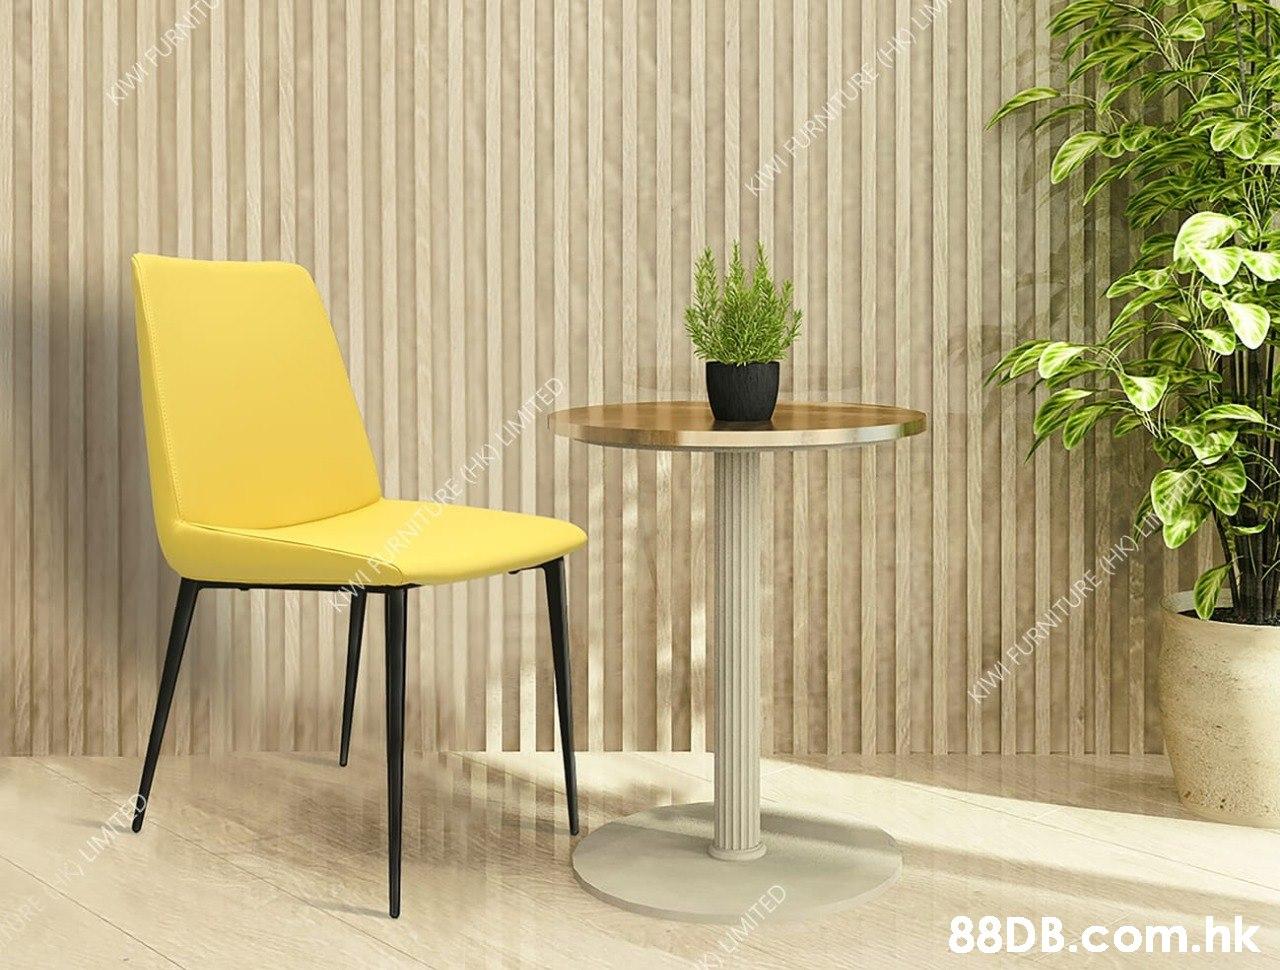 KiwrFURMIT IFURNITURE (HK) MAURNITURE (HK) tMITED RIMW FURNITURE (HK) LITTAN QLIMITED .hk DRE N LIMTHO  Furniture,Chair,Room,Table,Interior design